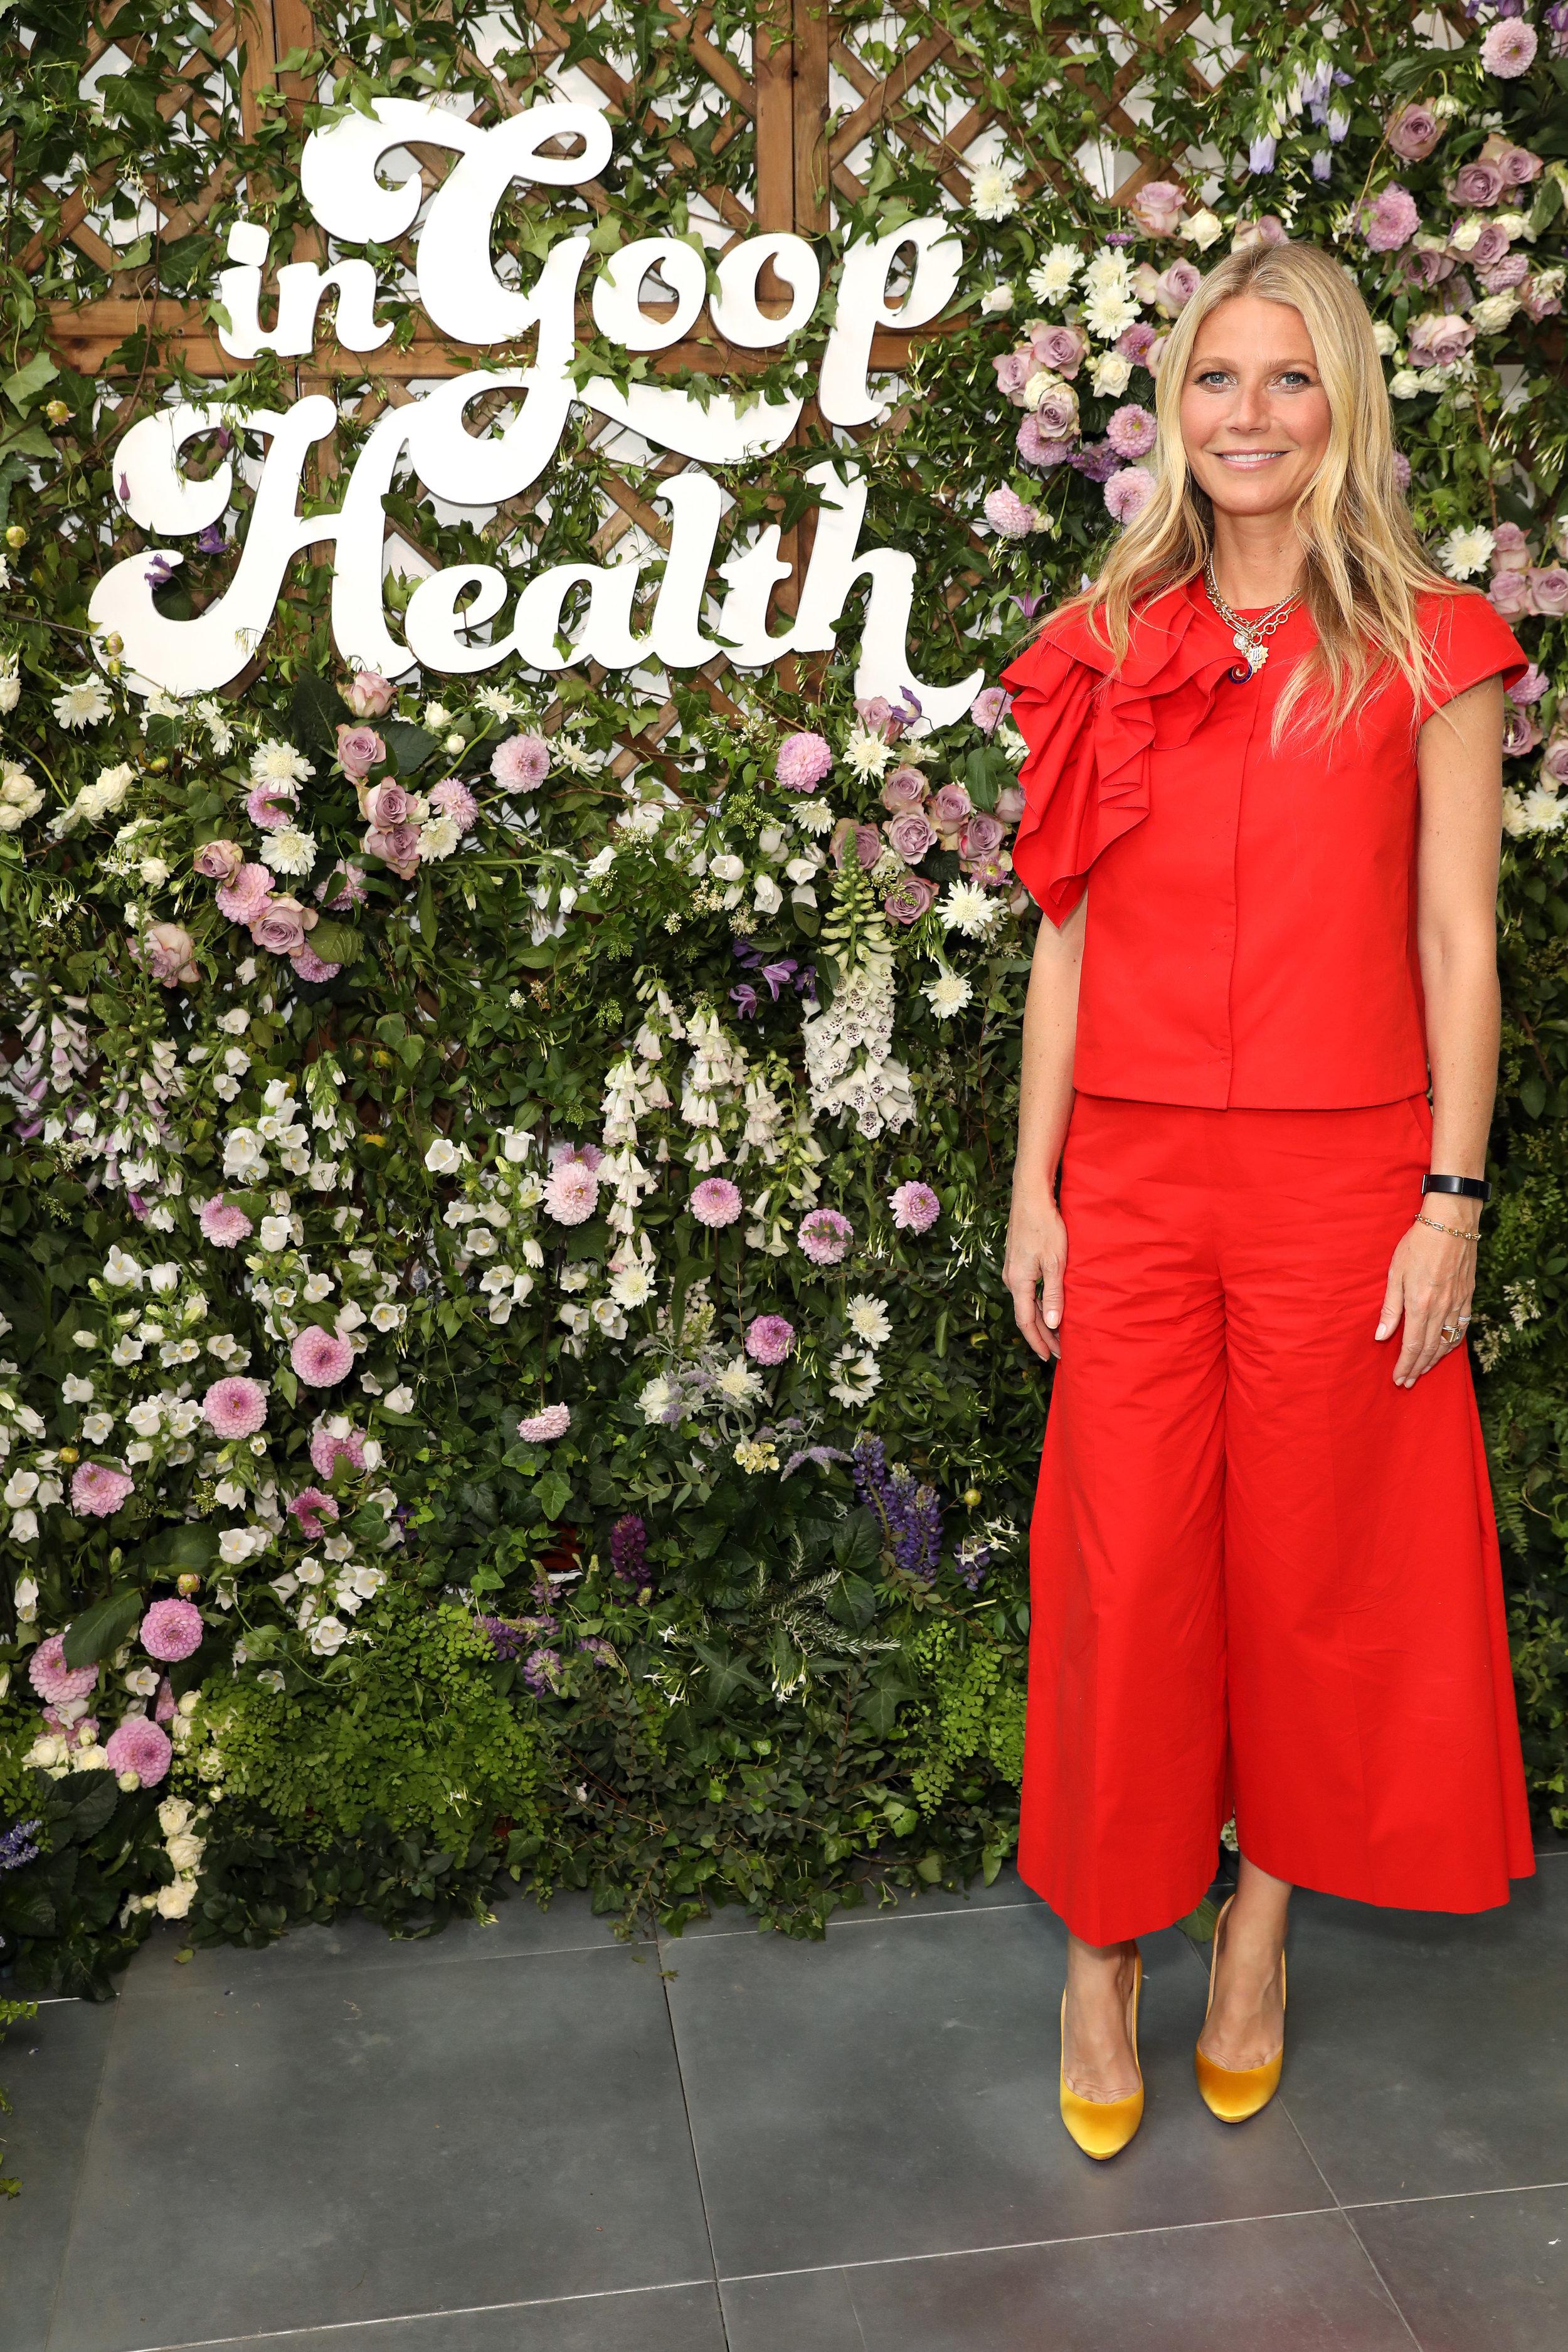 Gwyneth Paltrow attends In Goop Health London June 2019/ Styled by Natalie Hoselton